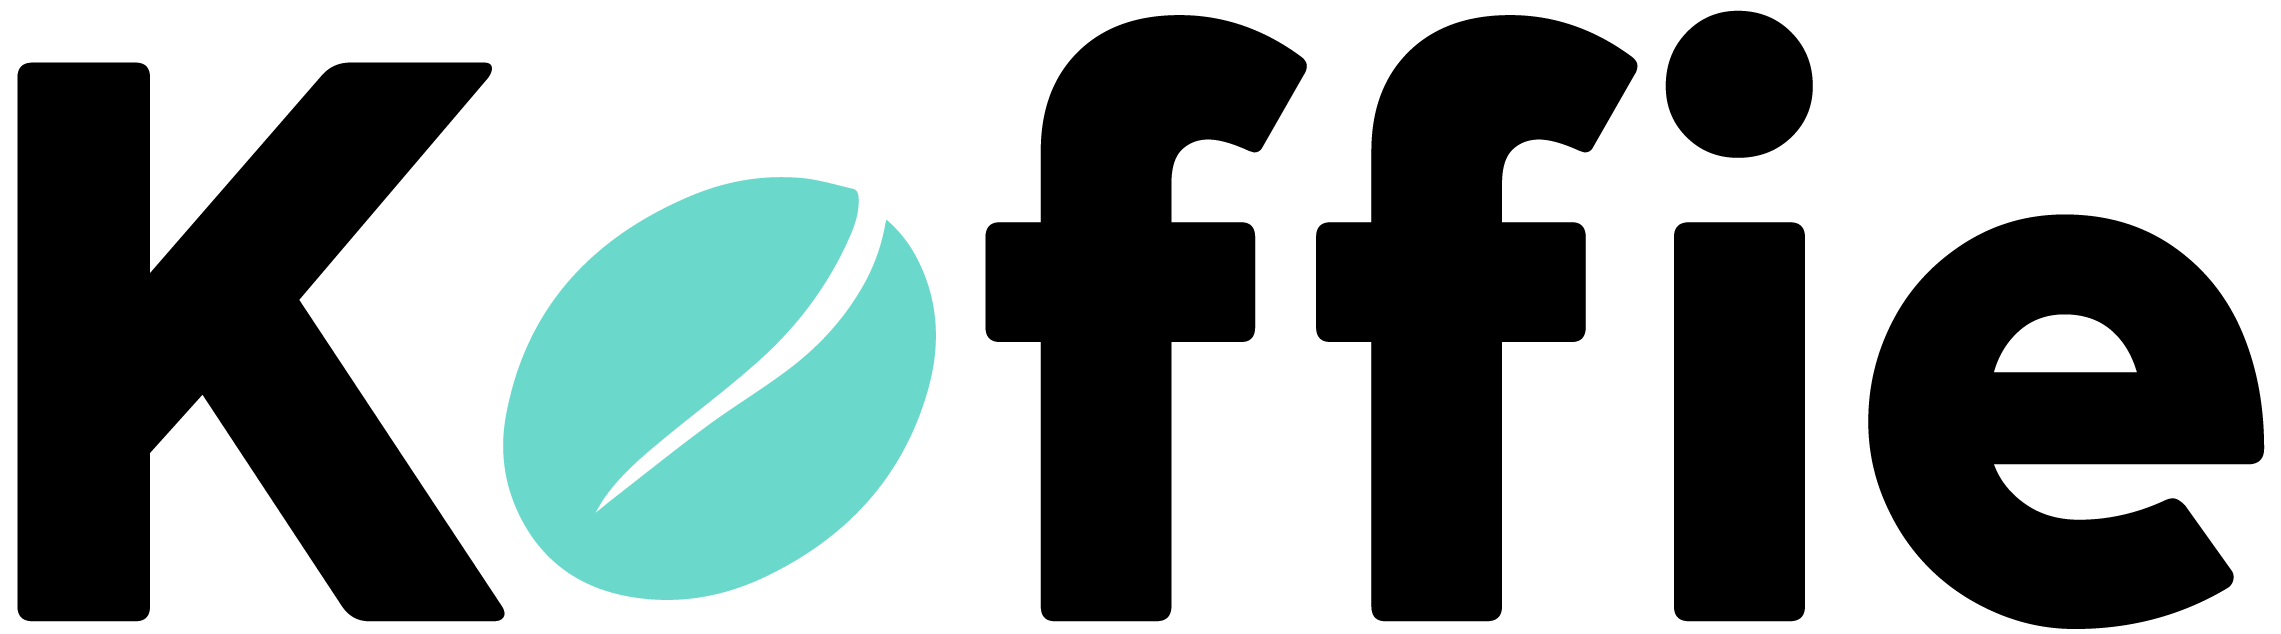 Koffie Labs (Logo)